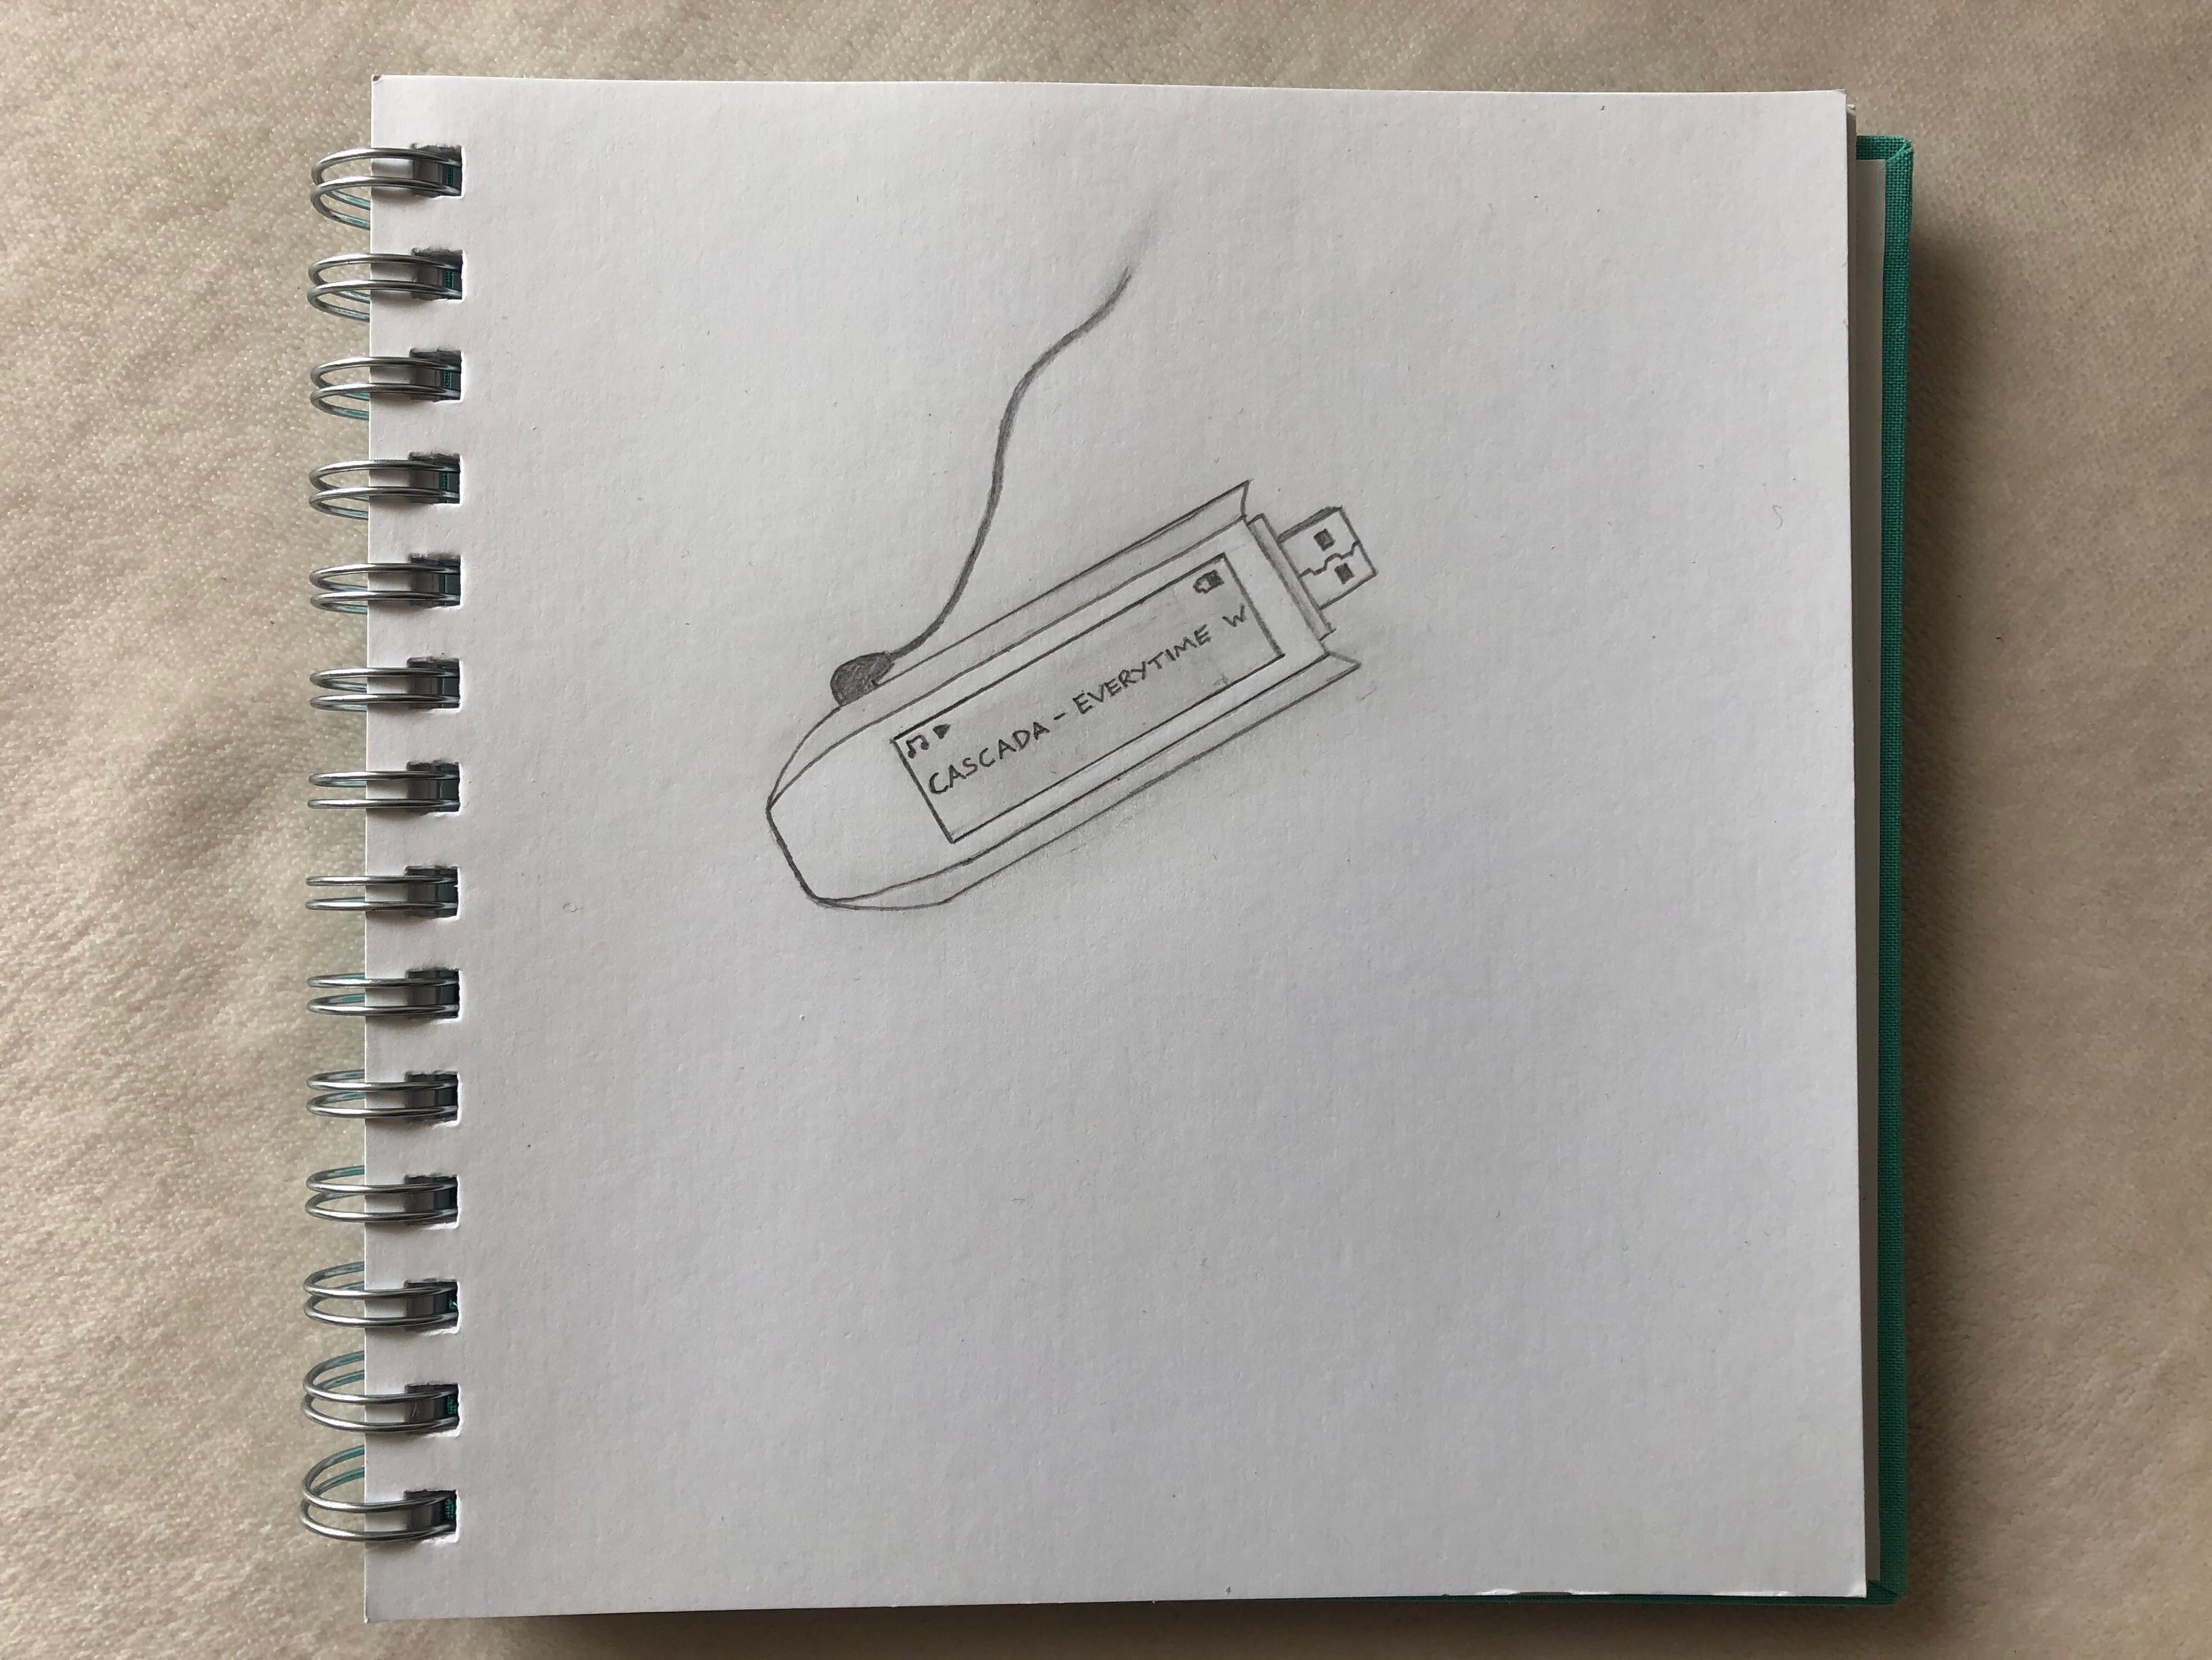 MP3 player sketch